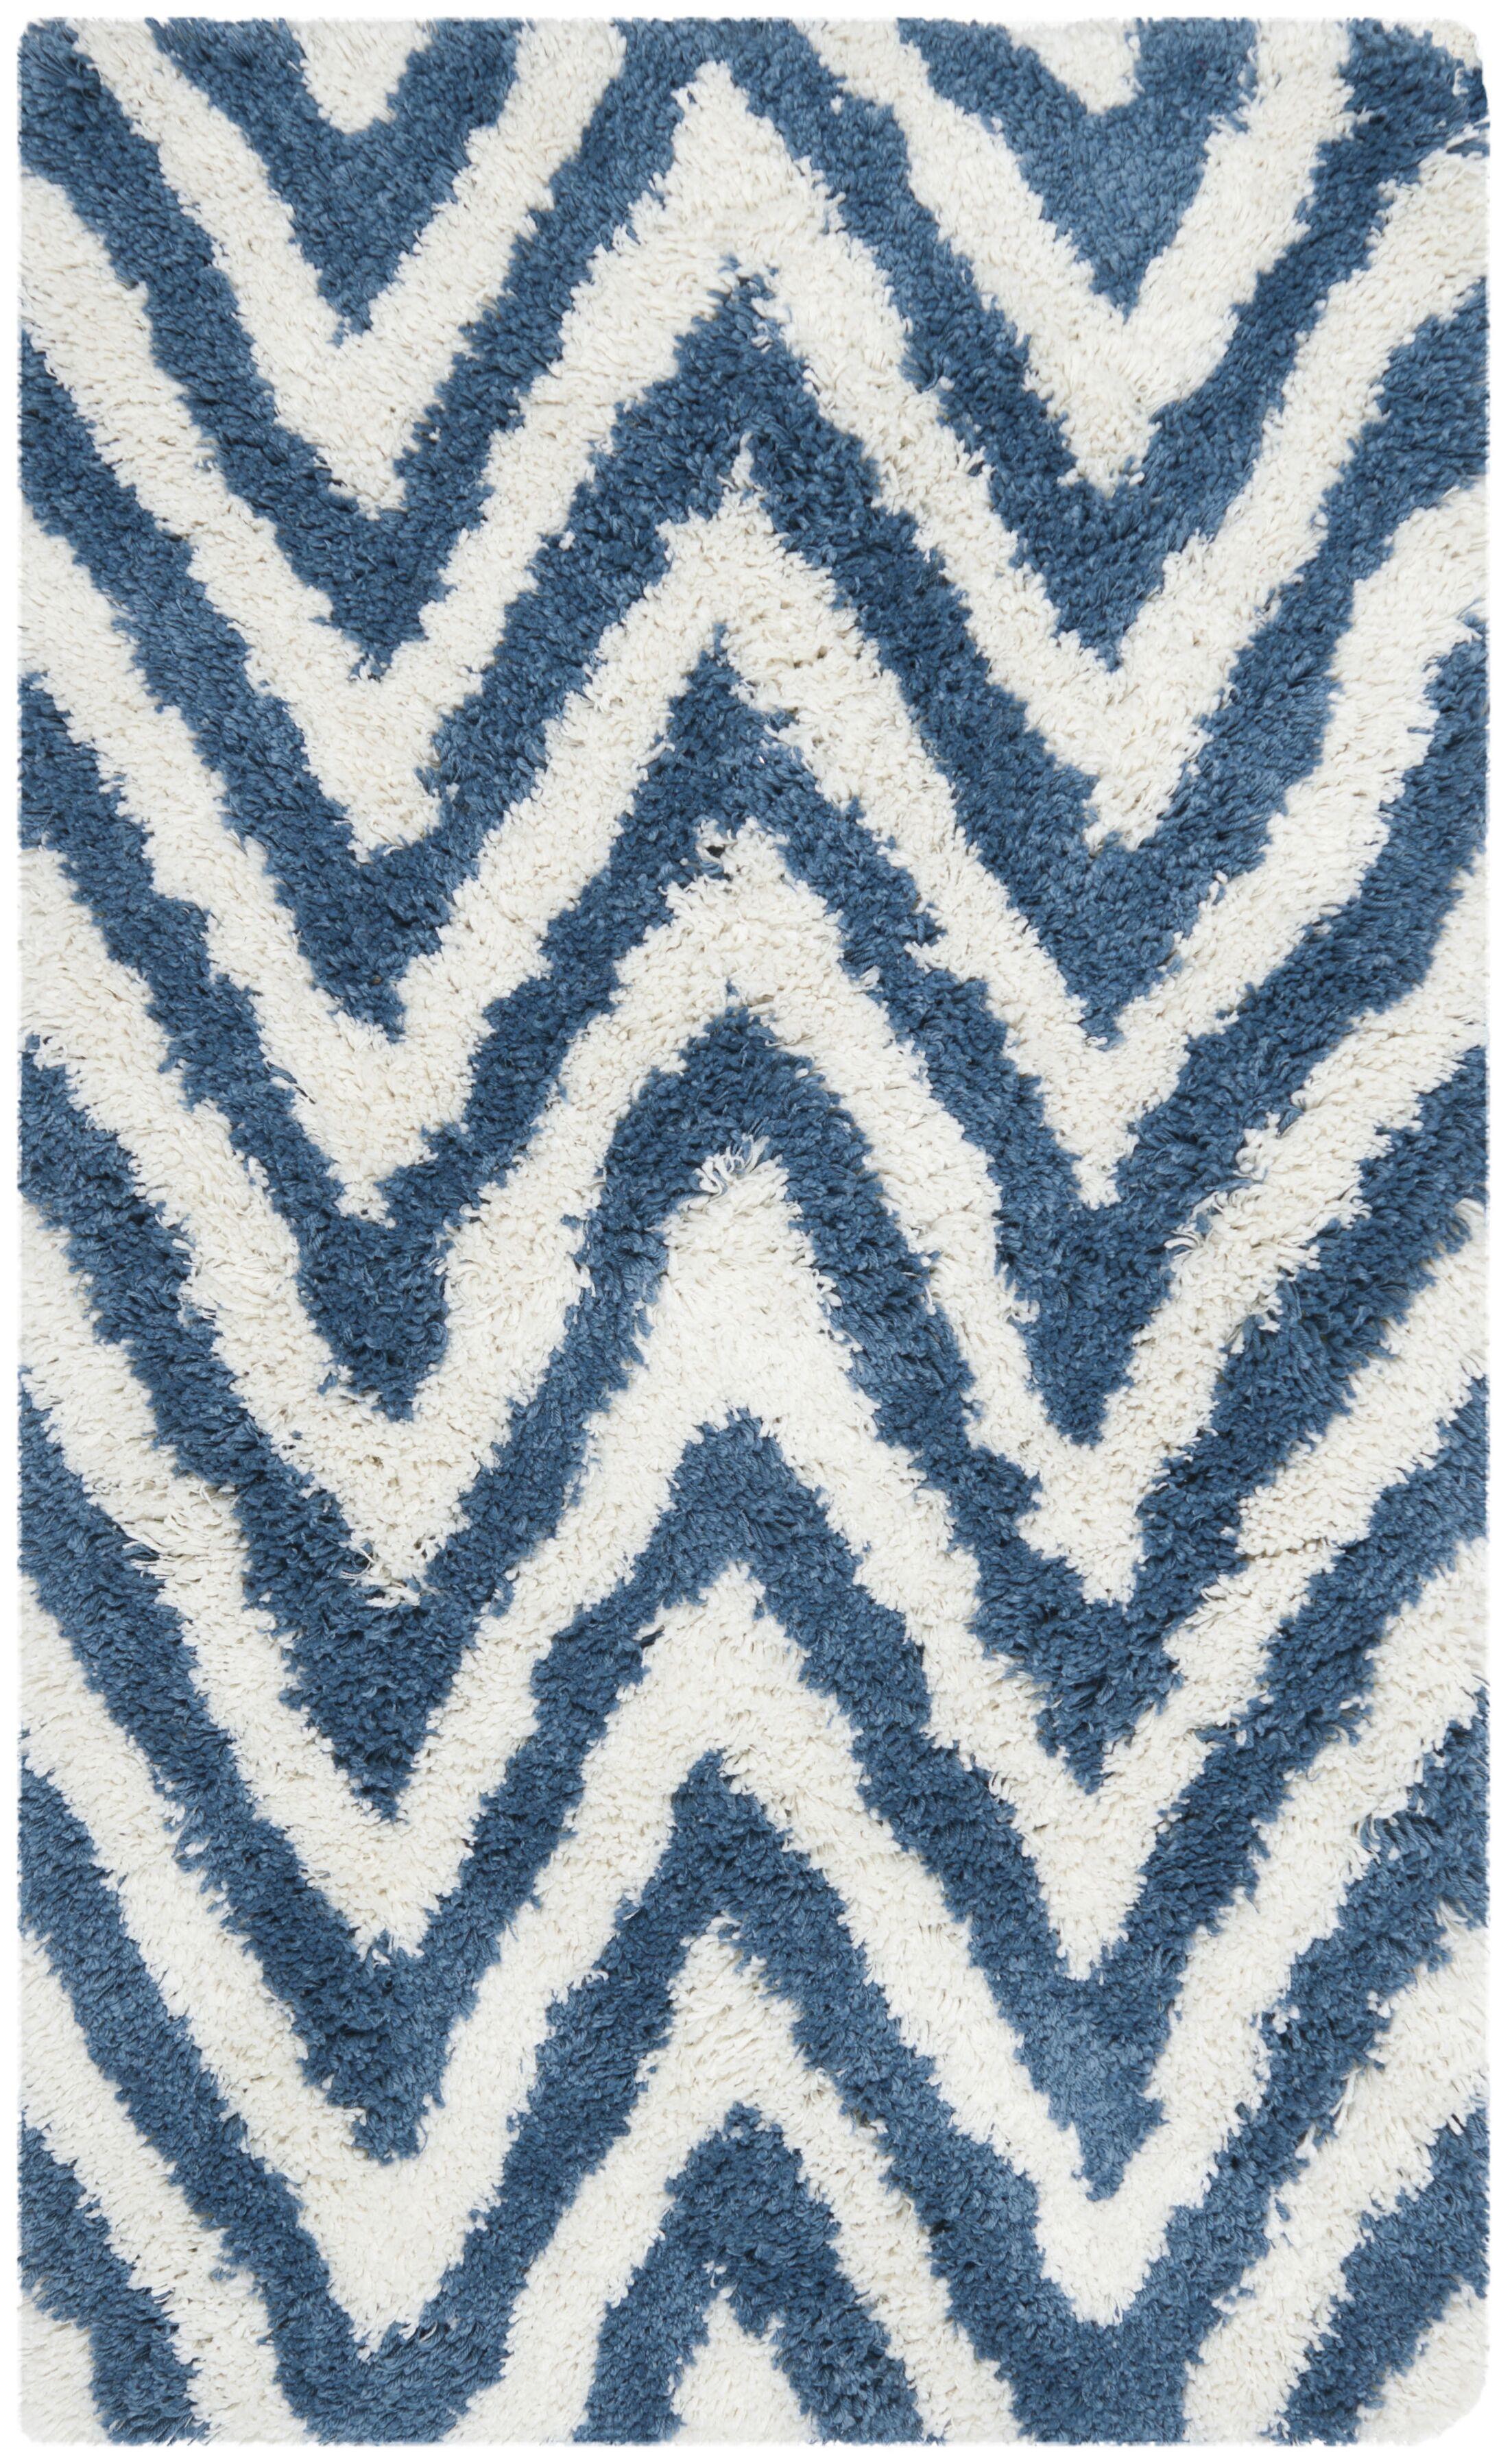 Davey Ivory/Blue Area Rug Rug Size: Rectangle 3' x 5'